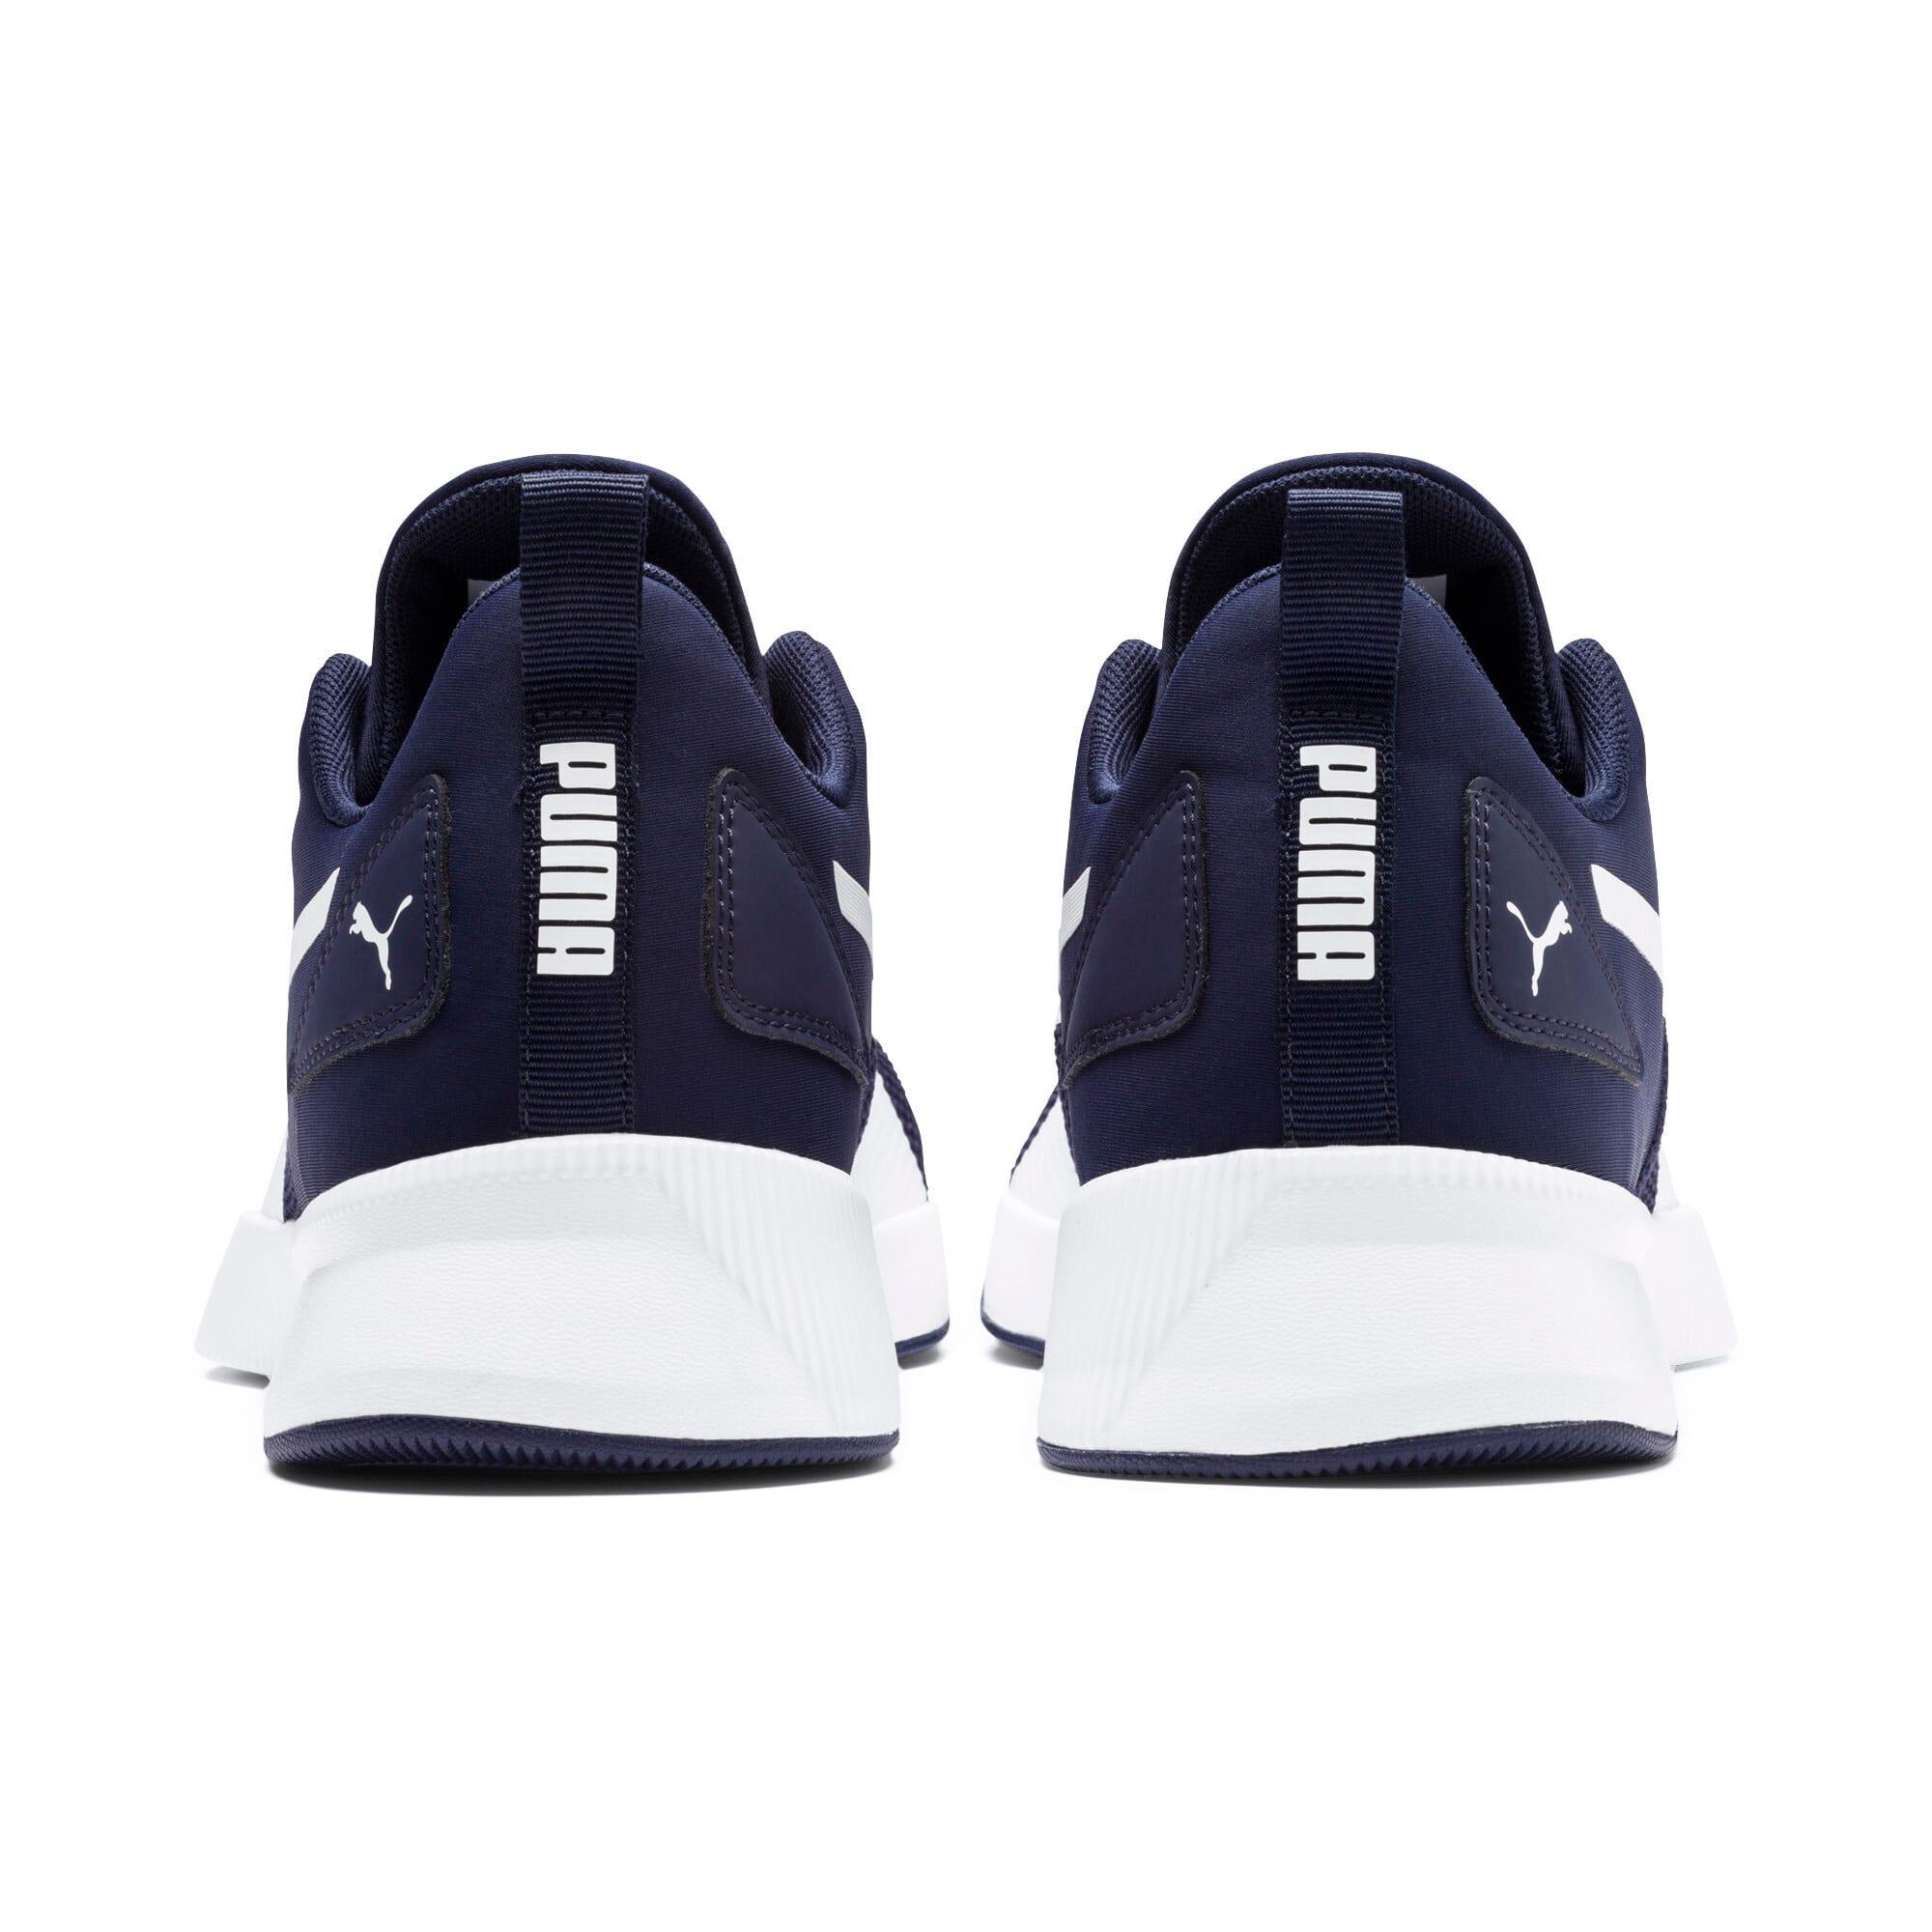 Thumbnail 3 of Flyer Runner Running Shoes, Peacoat-Puma White, medium